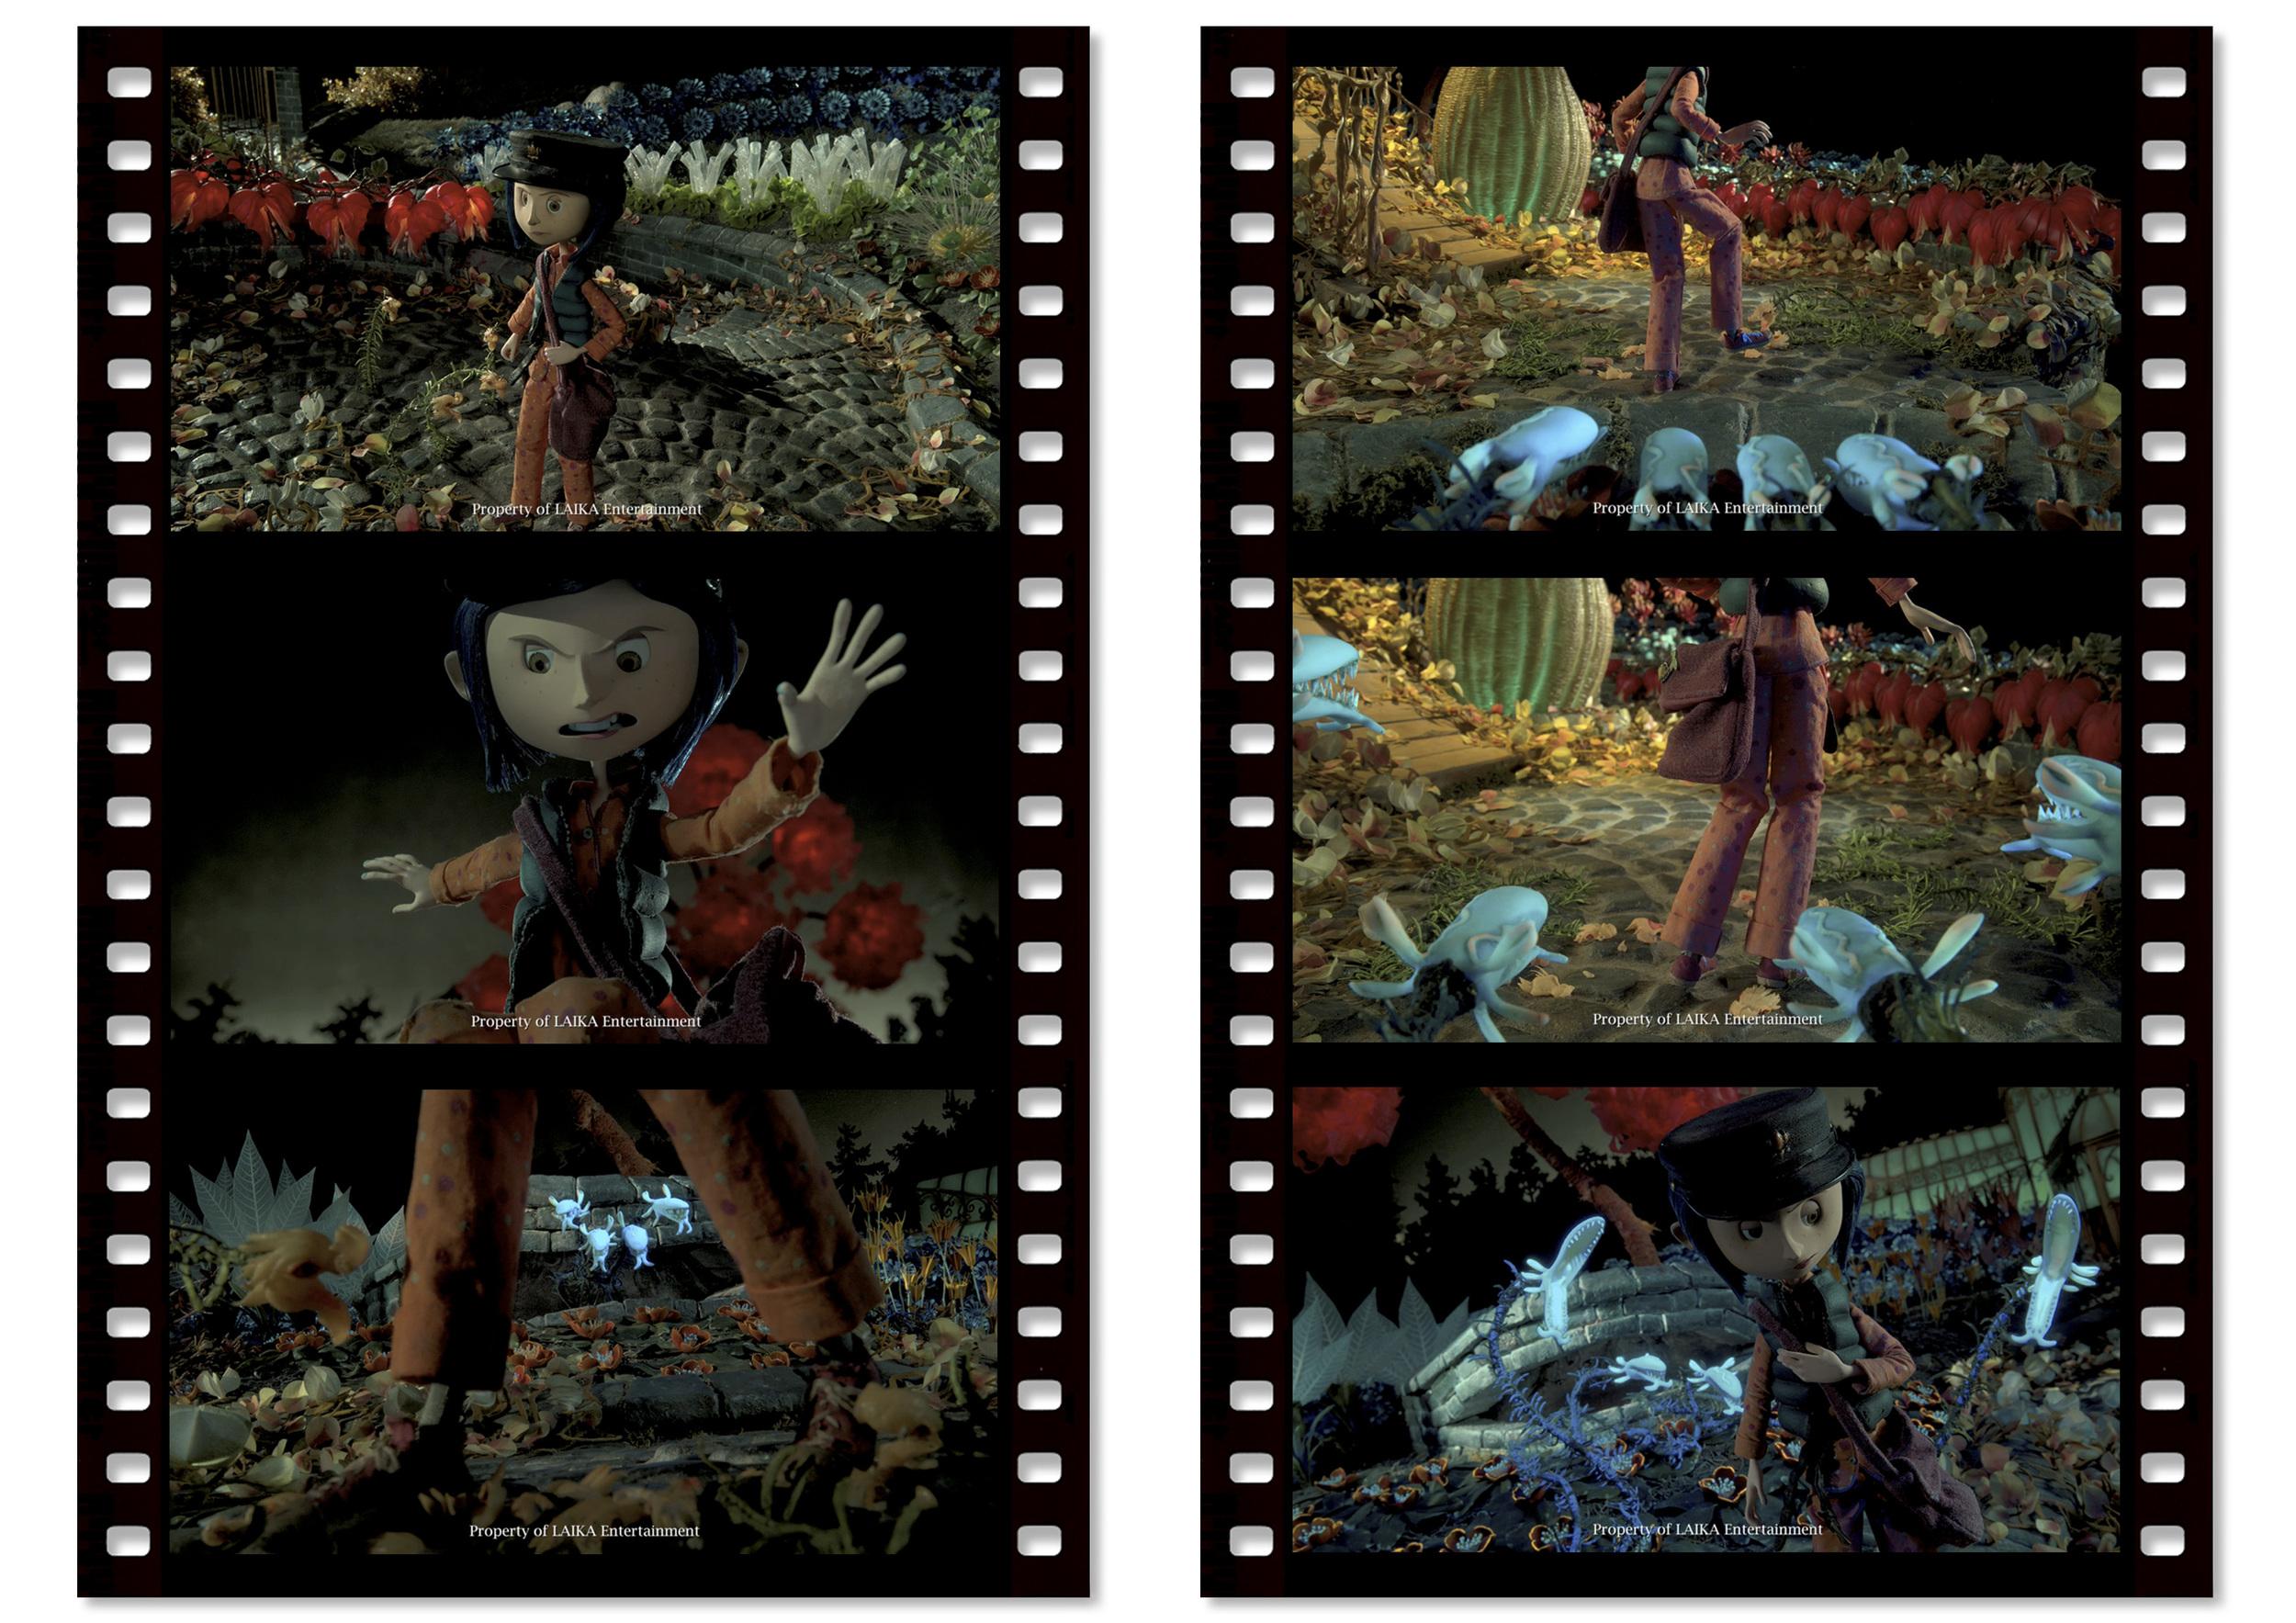 Coraline 6 images 8.jpg